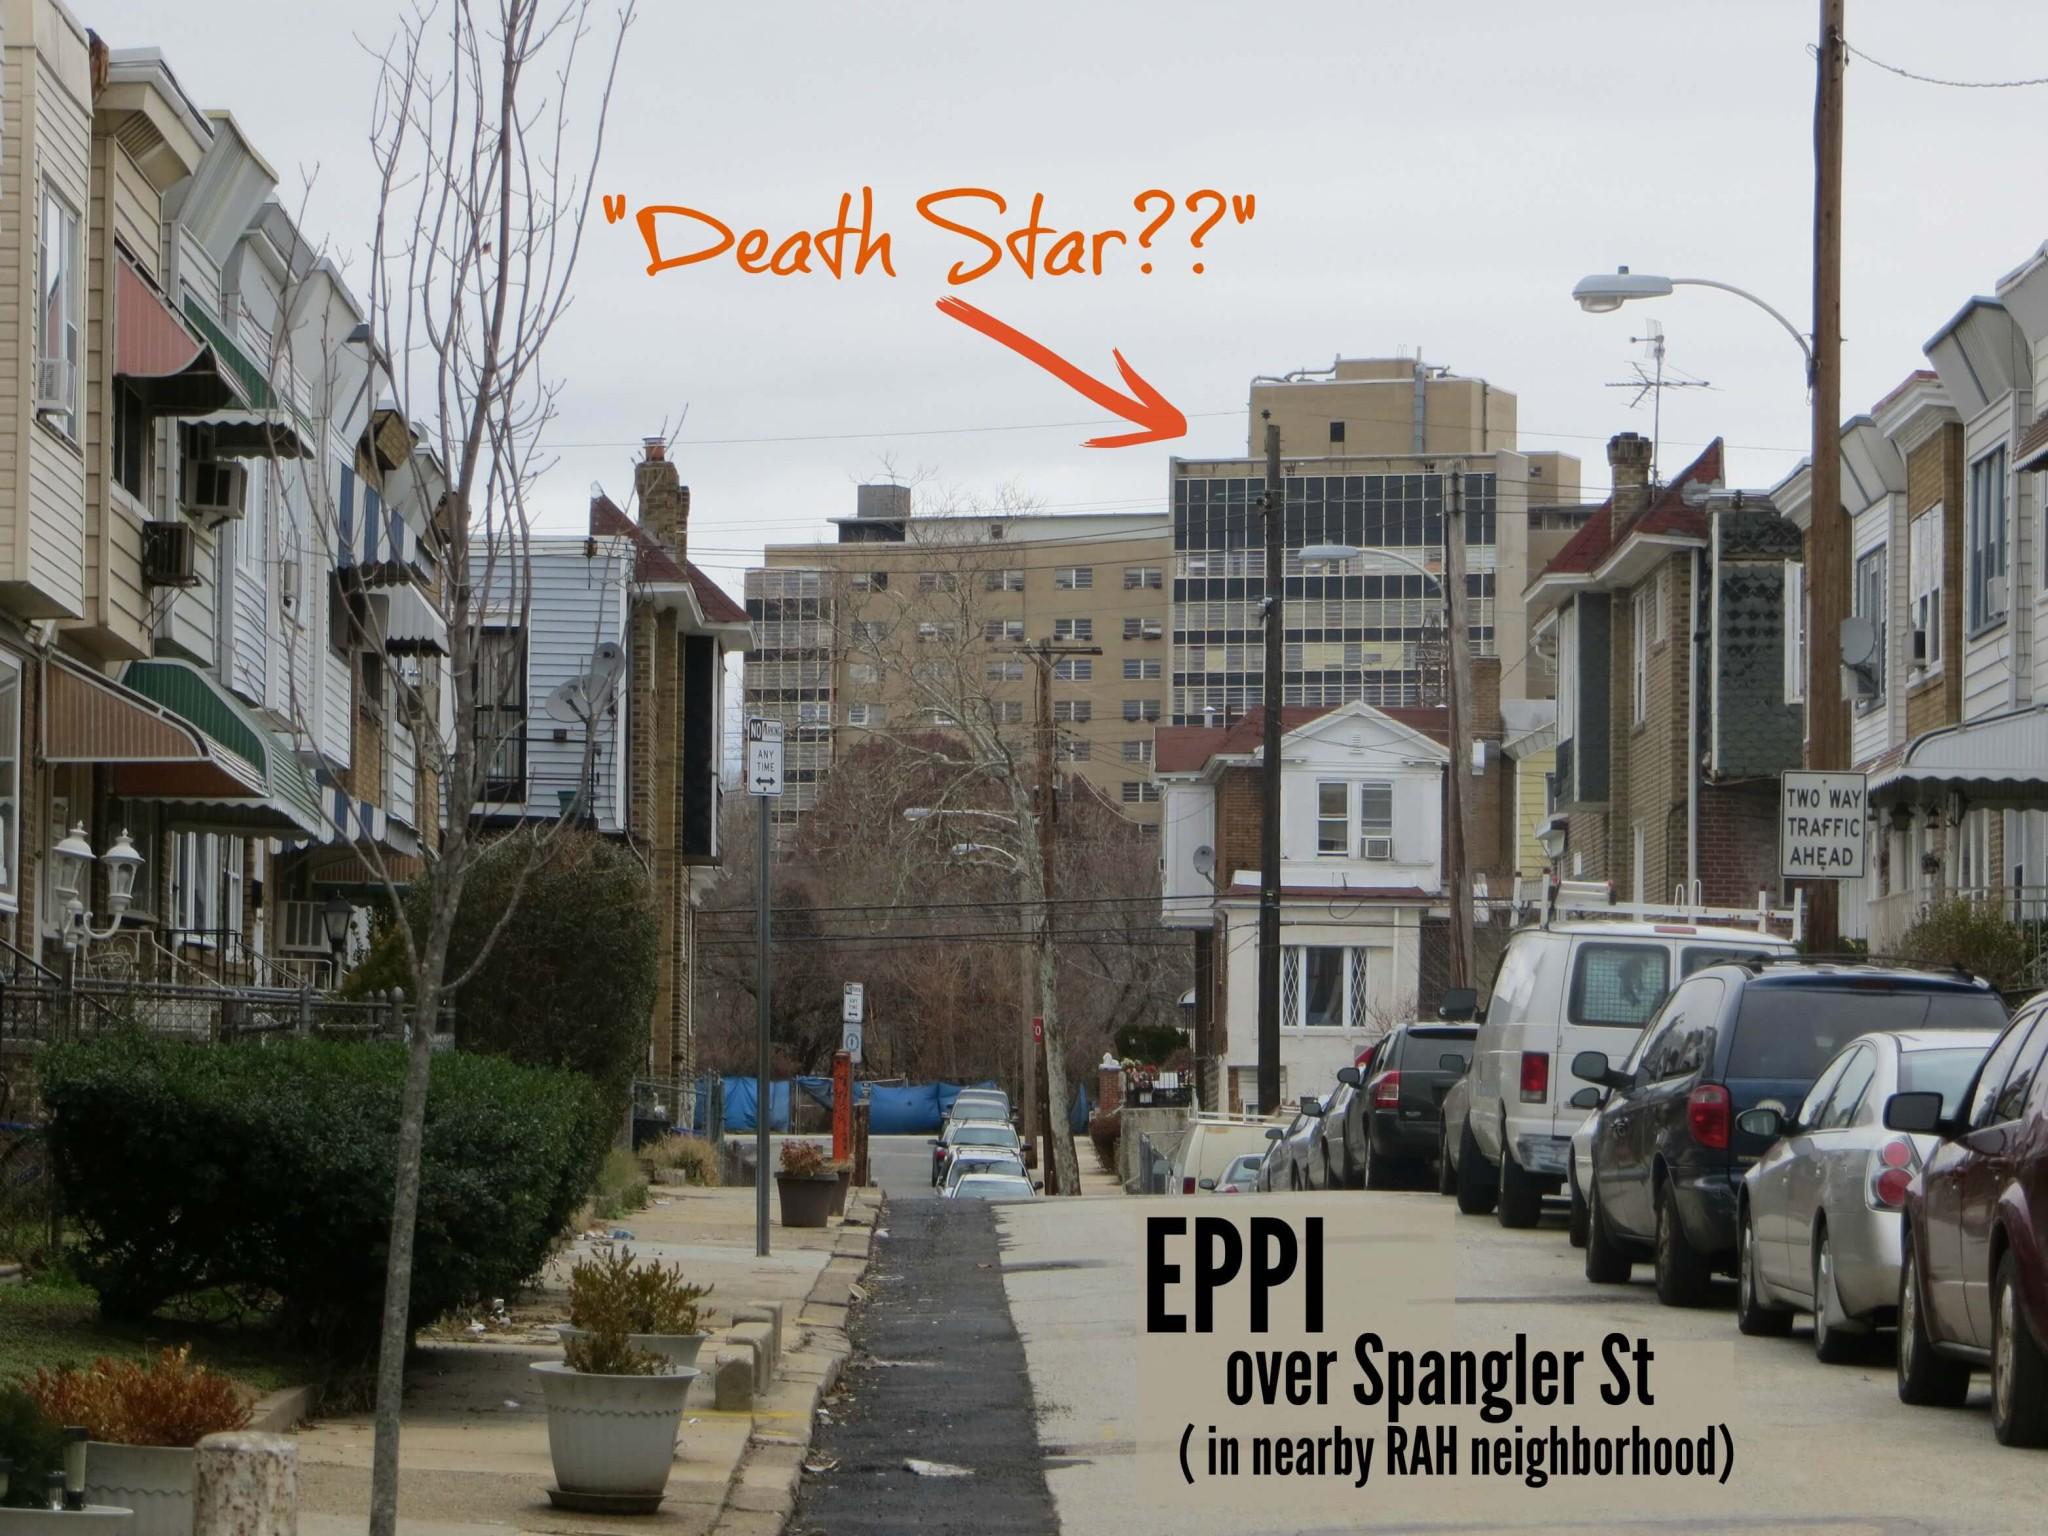 East Falls Local Eppi over Roses street